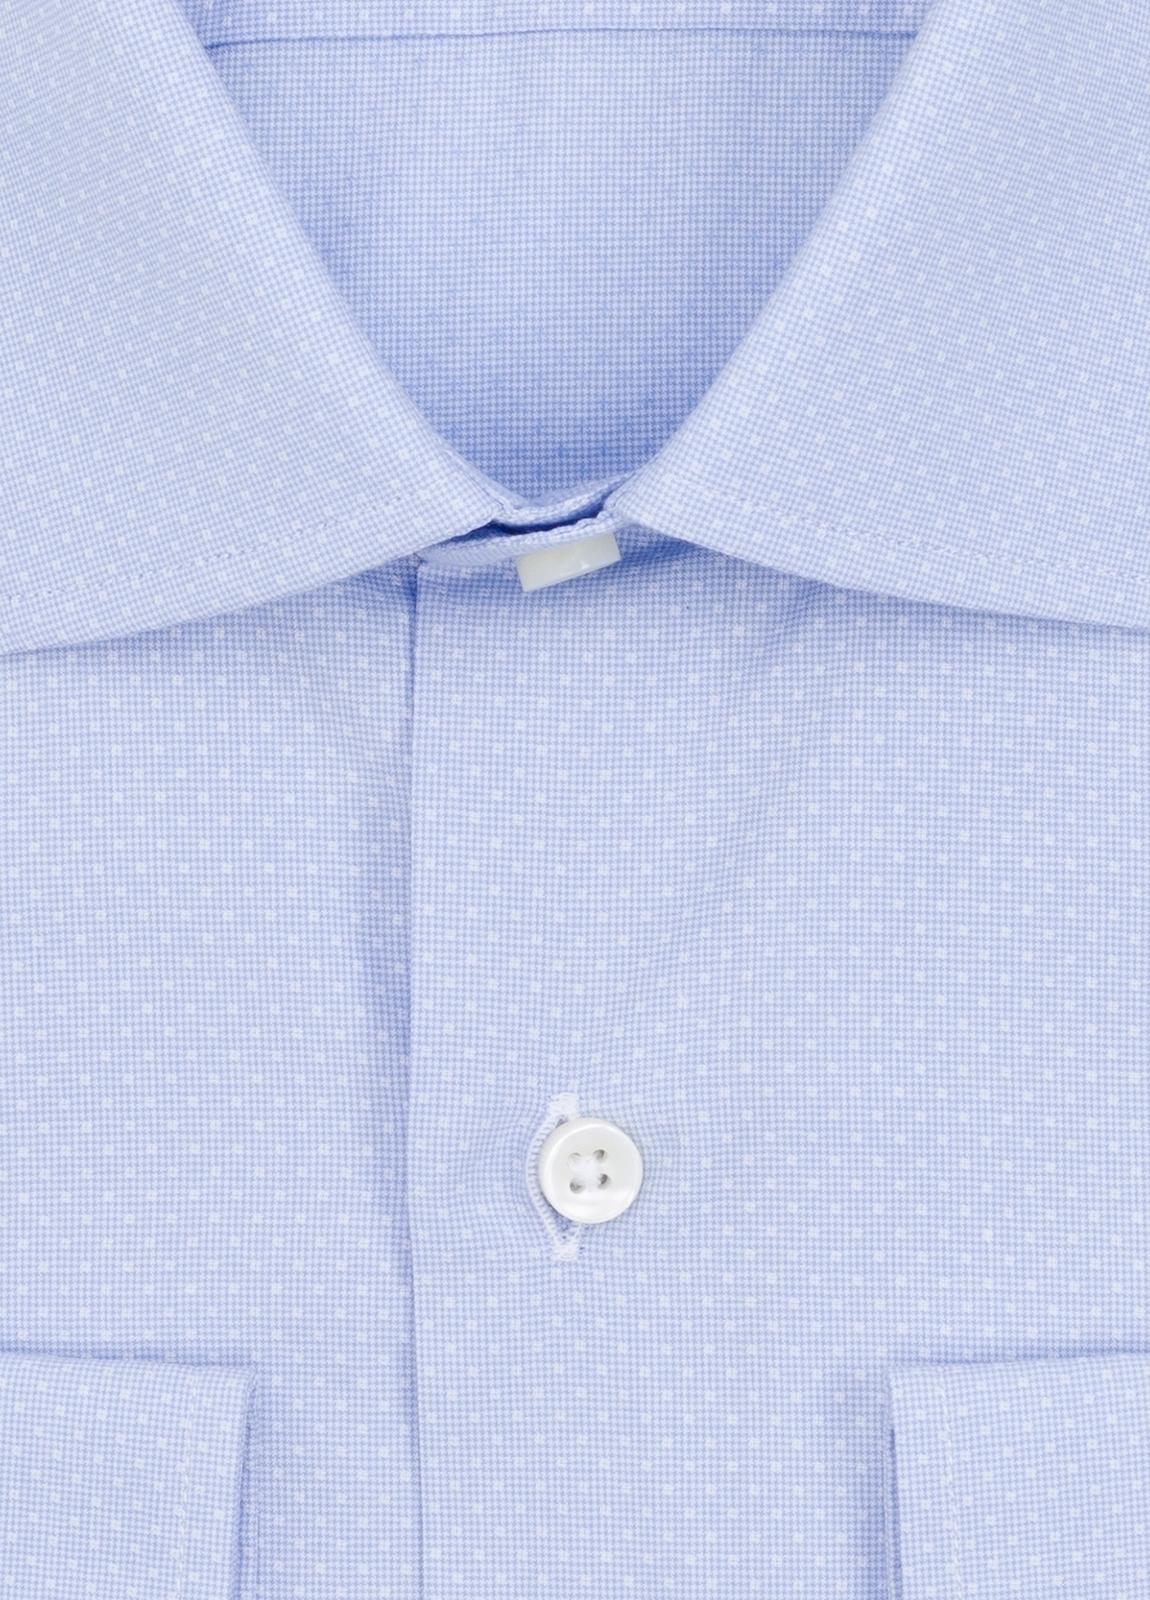 Camisa Formal Wear SLIM FIT cuello italiano modelo ROMA microdibujo color celeste. 100% Algodón. - Ítem1